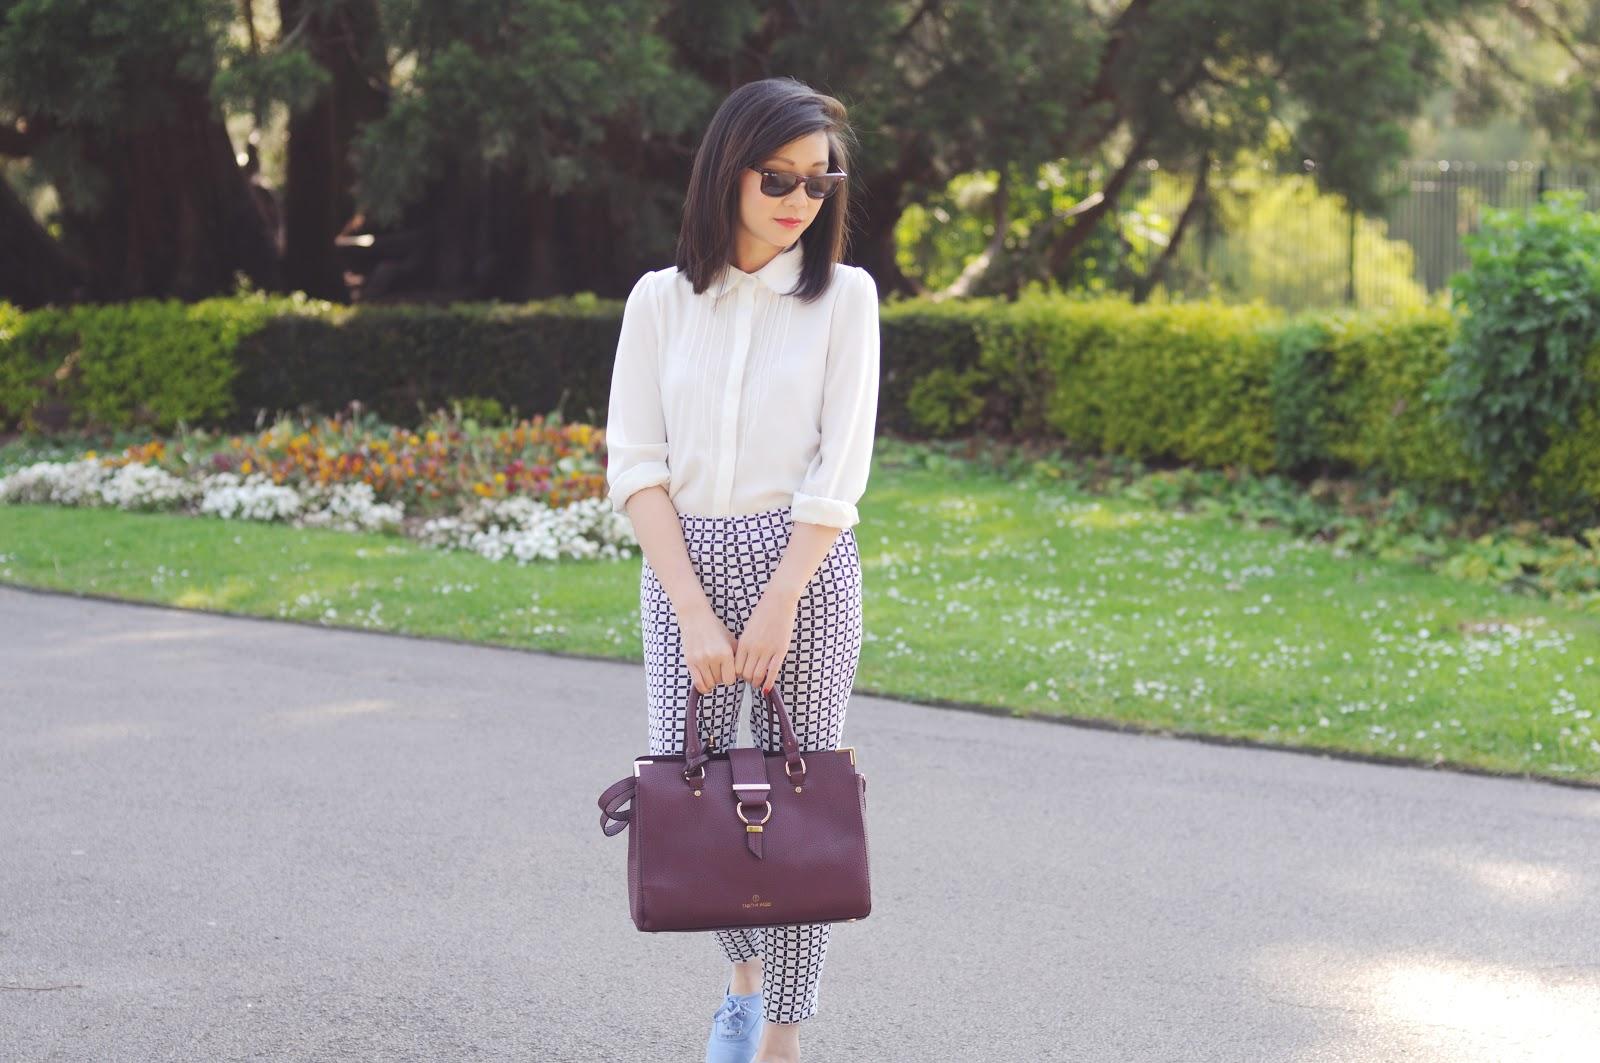 uk fashion blogger, avon tabitha webb handbag collection